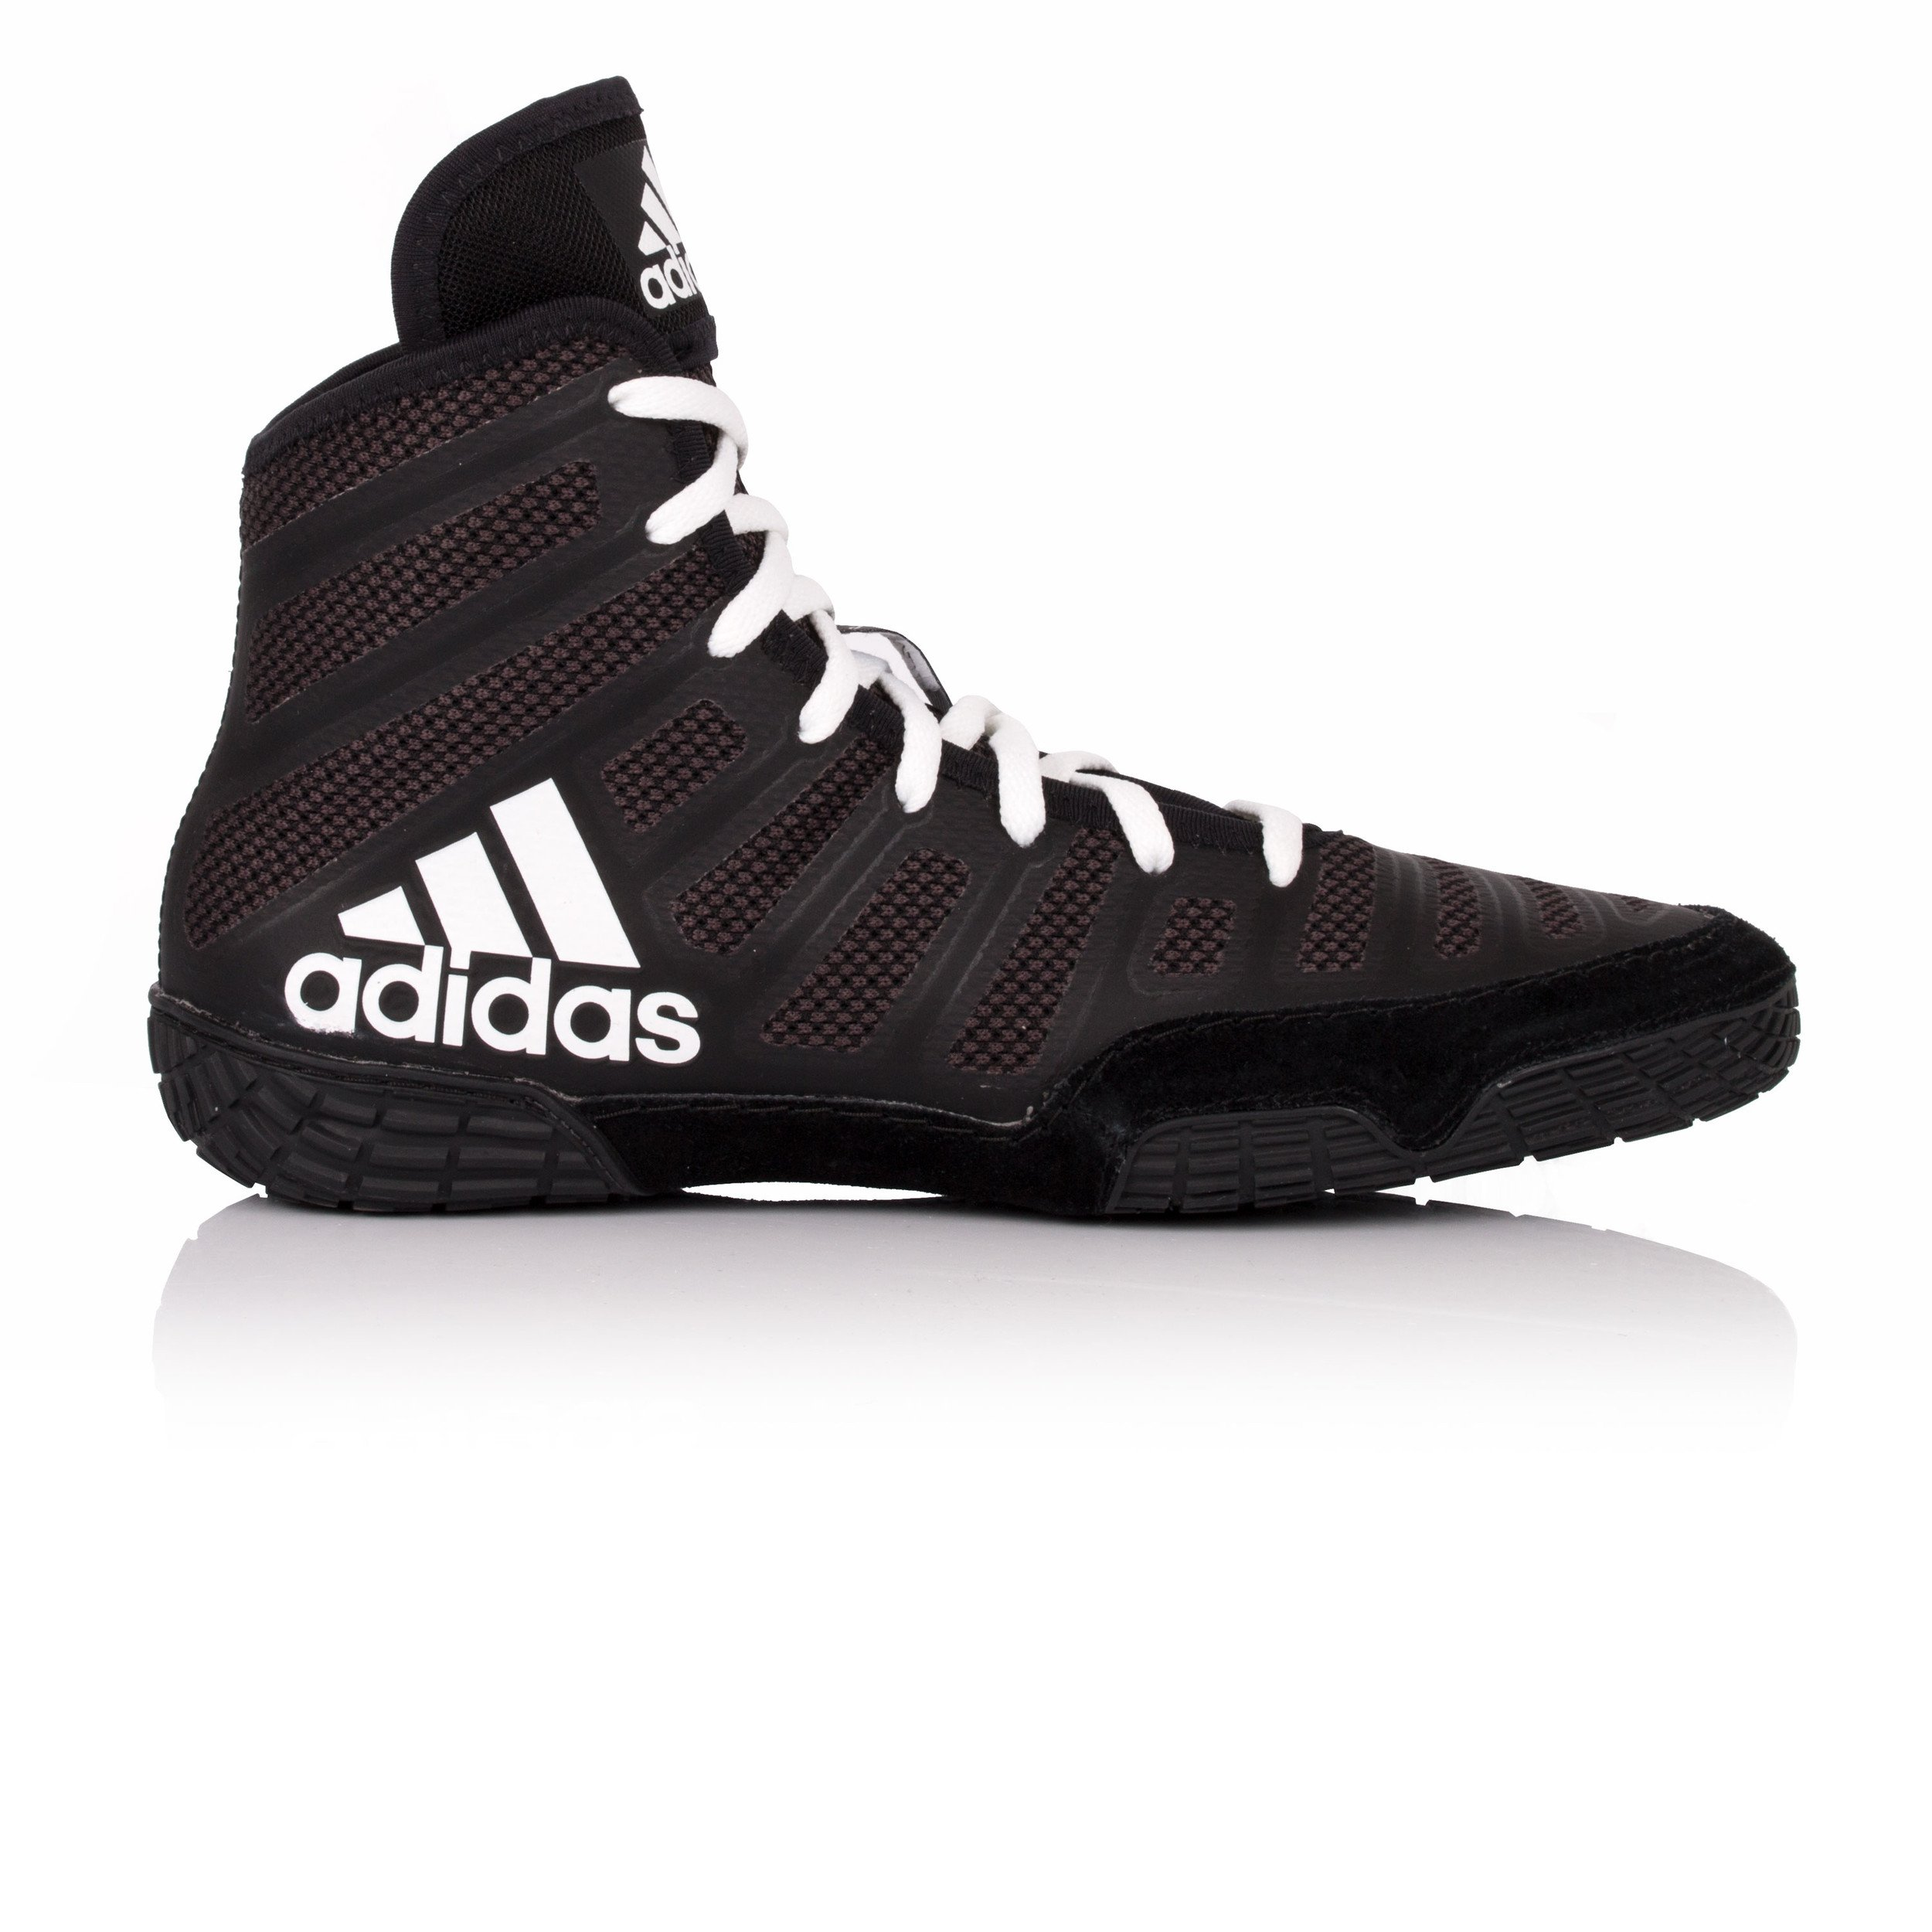 Adidas Varner Wrestling Boots - SS18-10.5 - Black by adidas